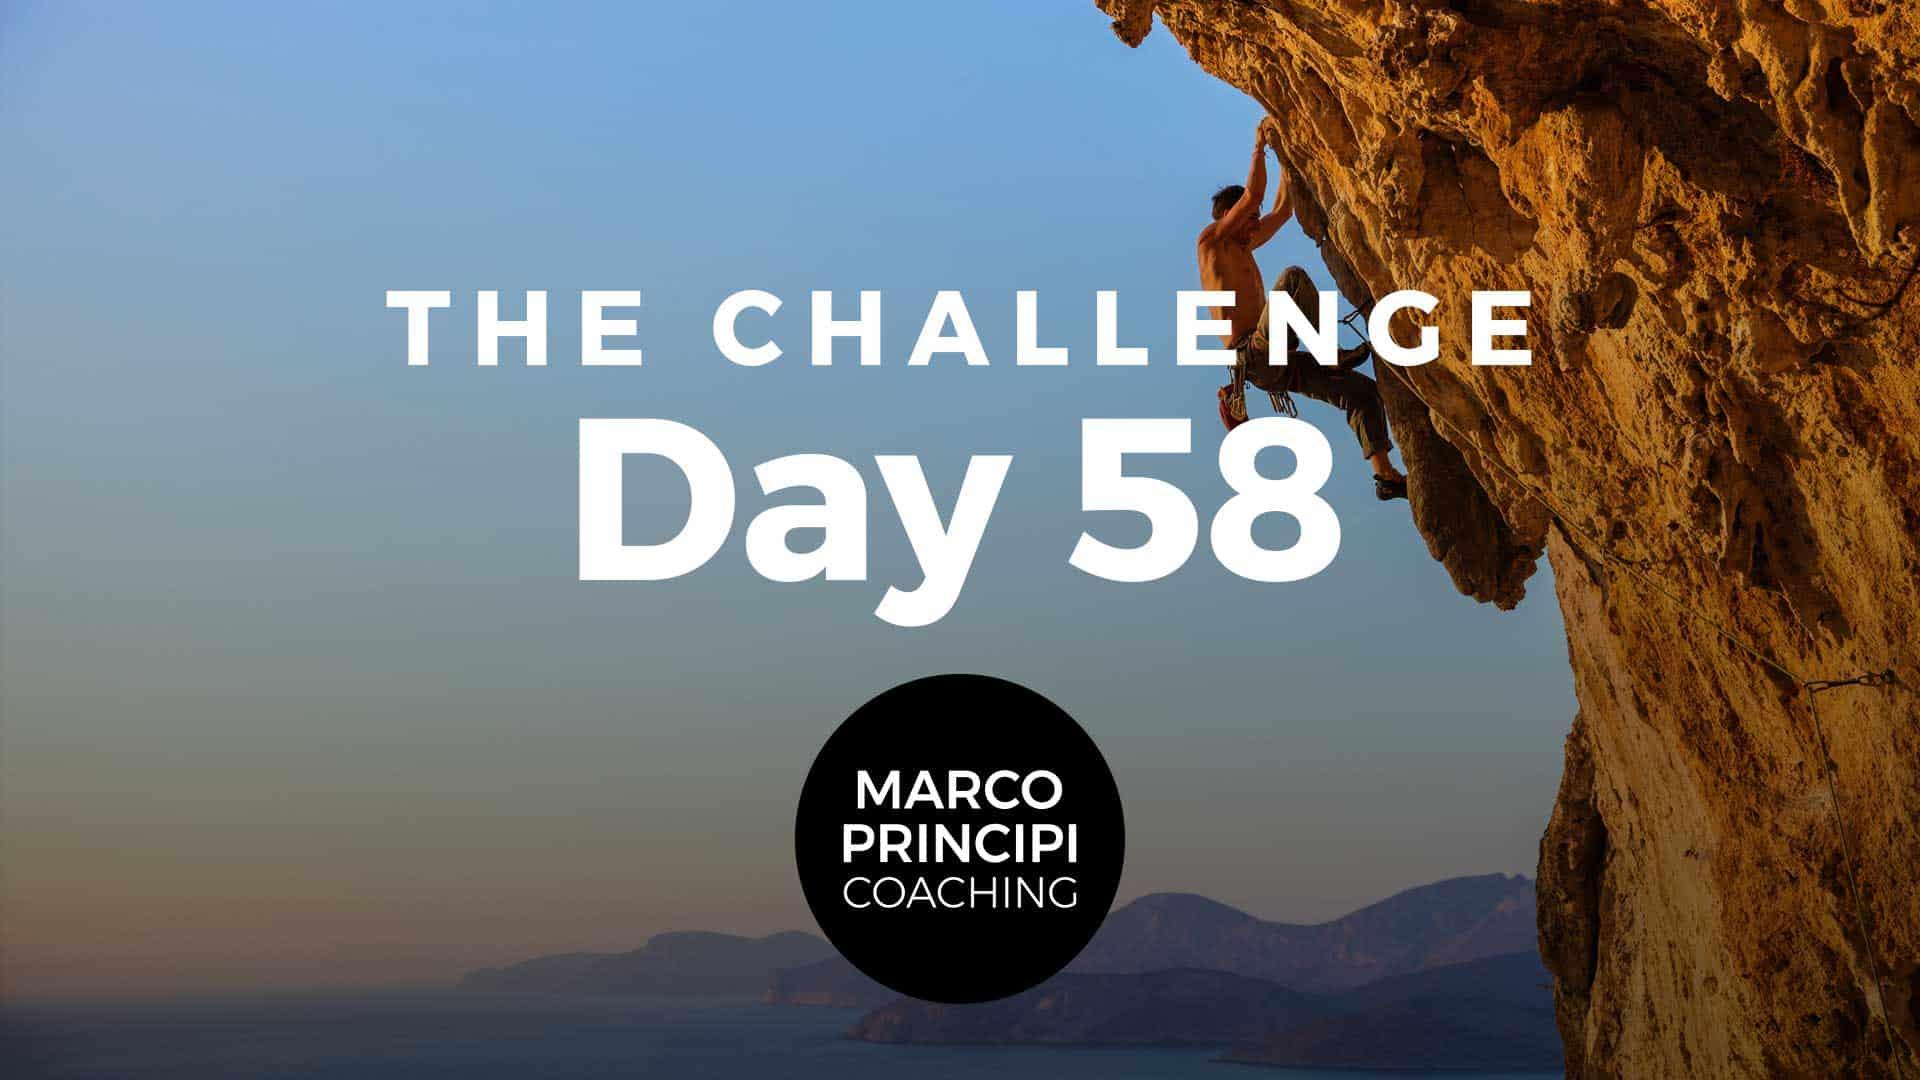 Marco Principi The Challenge Day 58